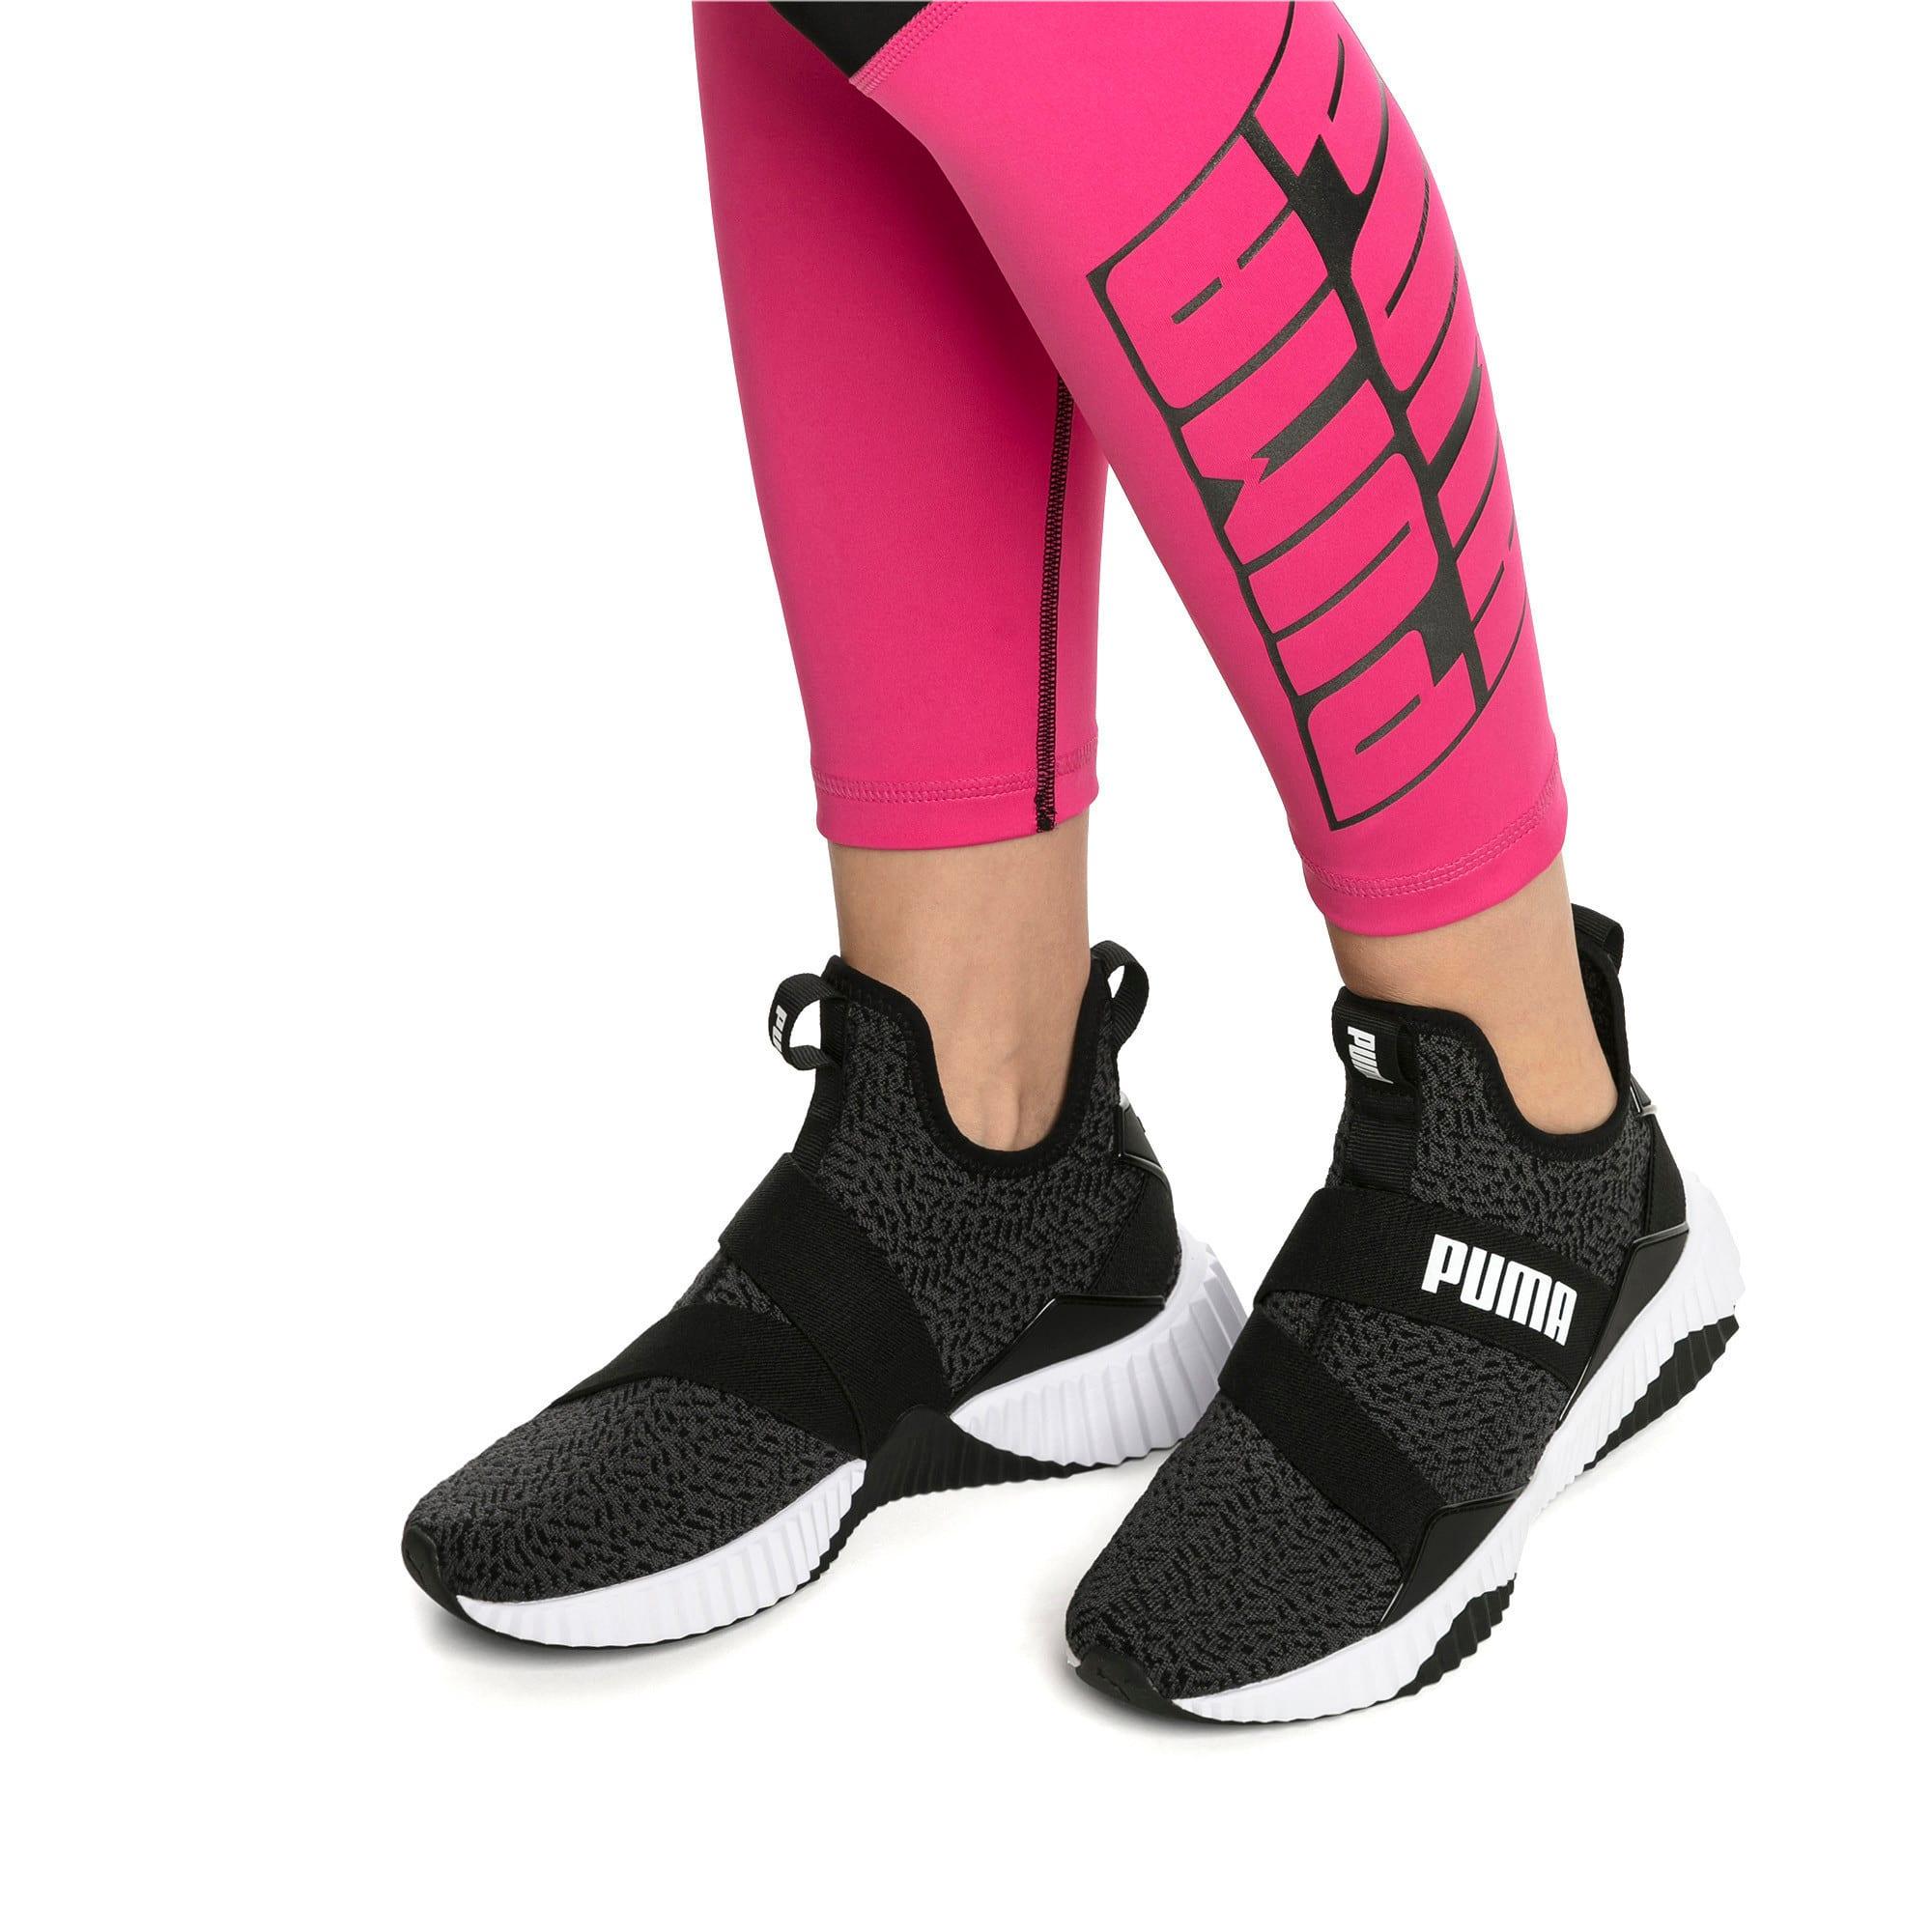 Thumbnail 3 of Defy Mid Animal Women's Training Shoes, Puma Black-Puma White, medium-IND